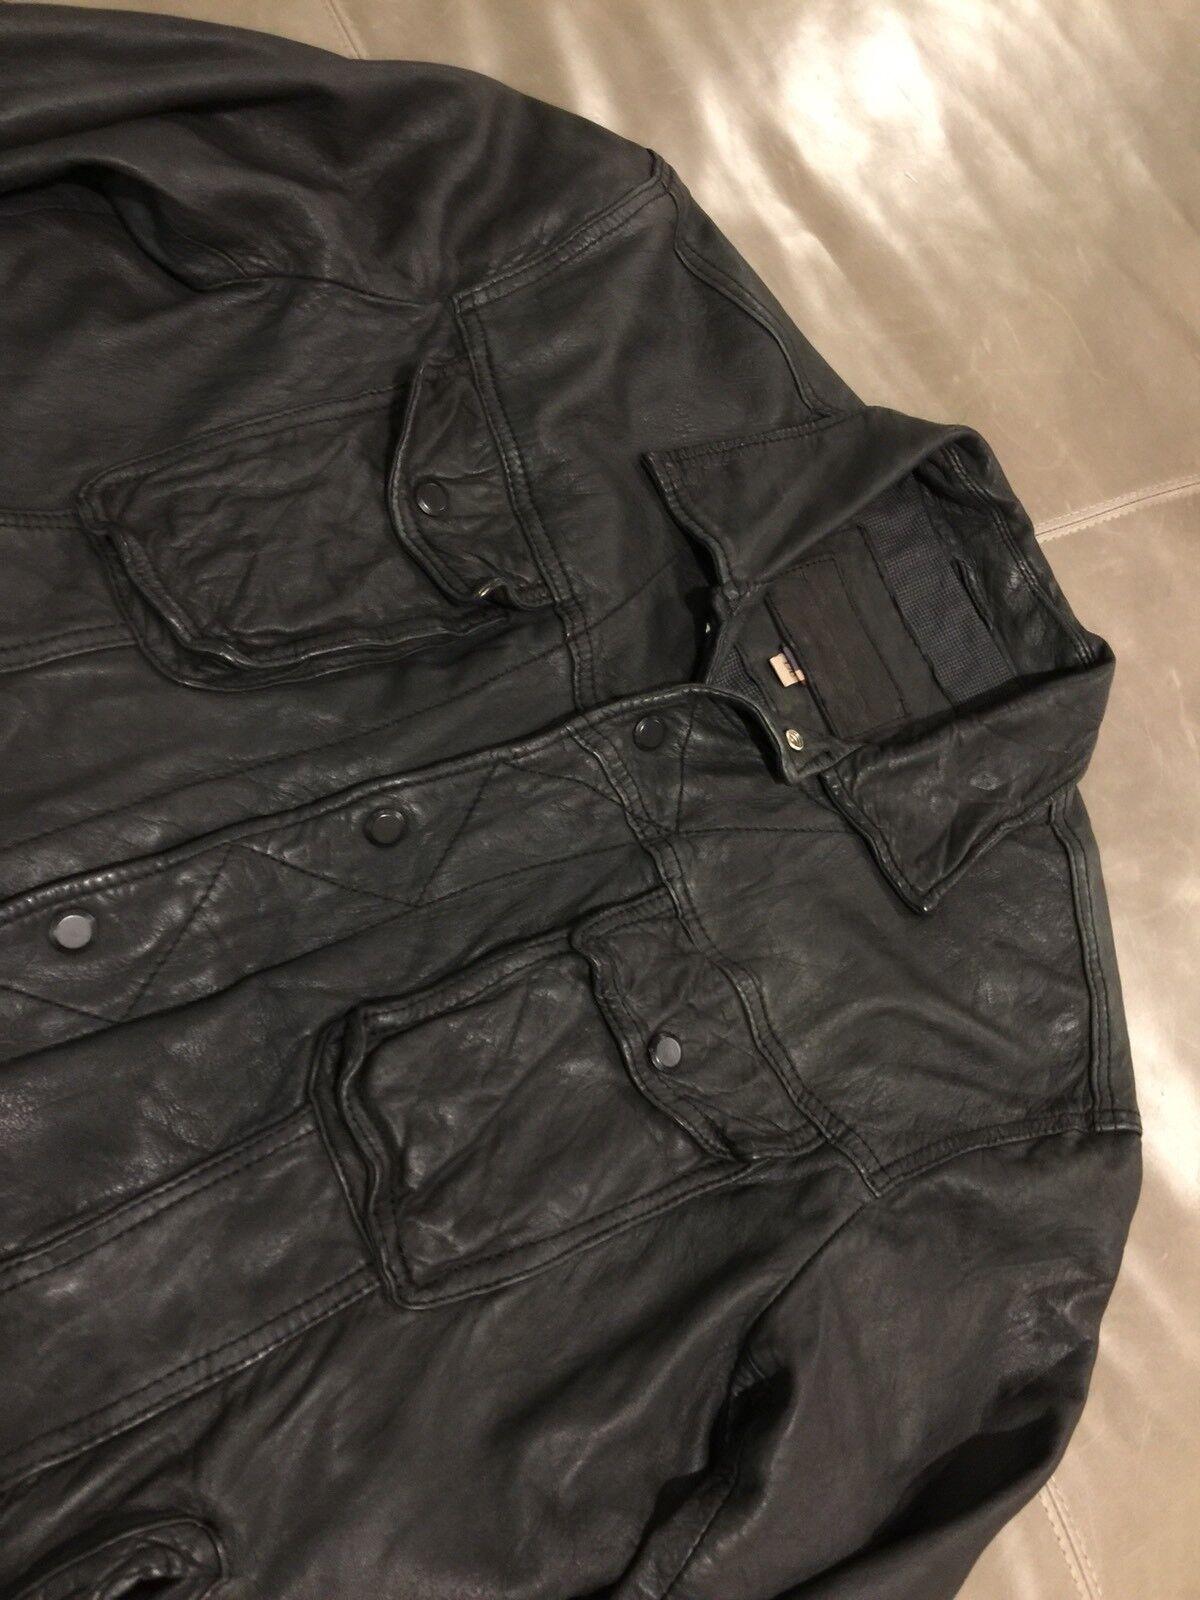 Kosiuko Herencia silverina Mens 100% Leather Jacket Black Large  895